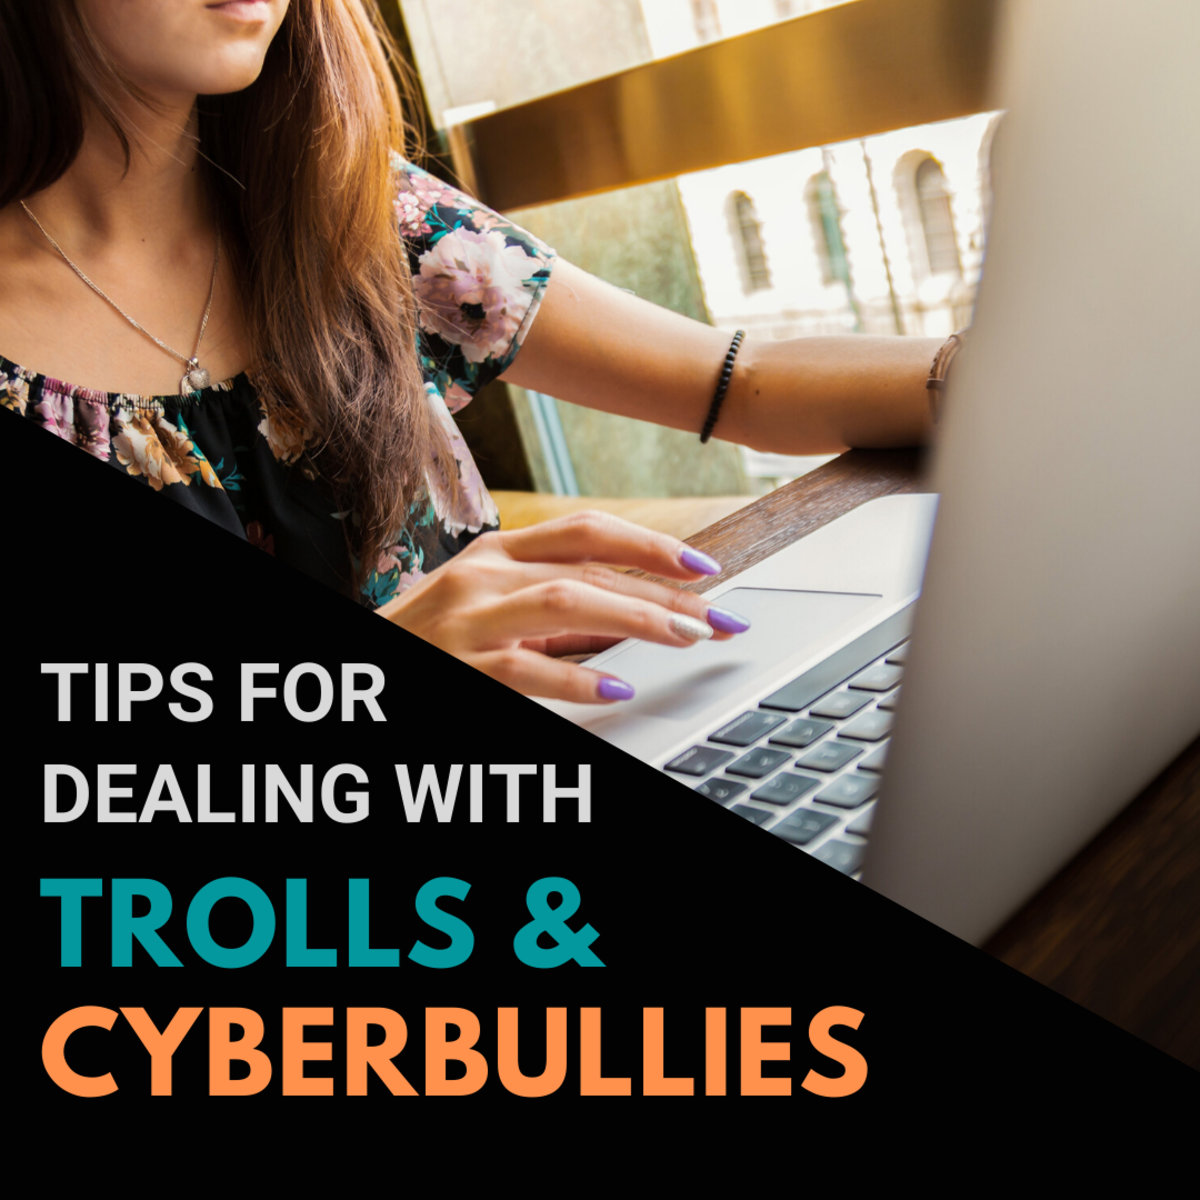 10 Tips for Handling Trolls and Cyberbullies